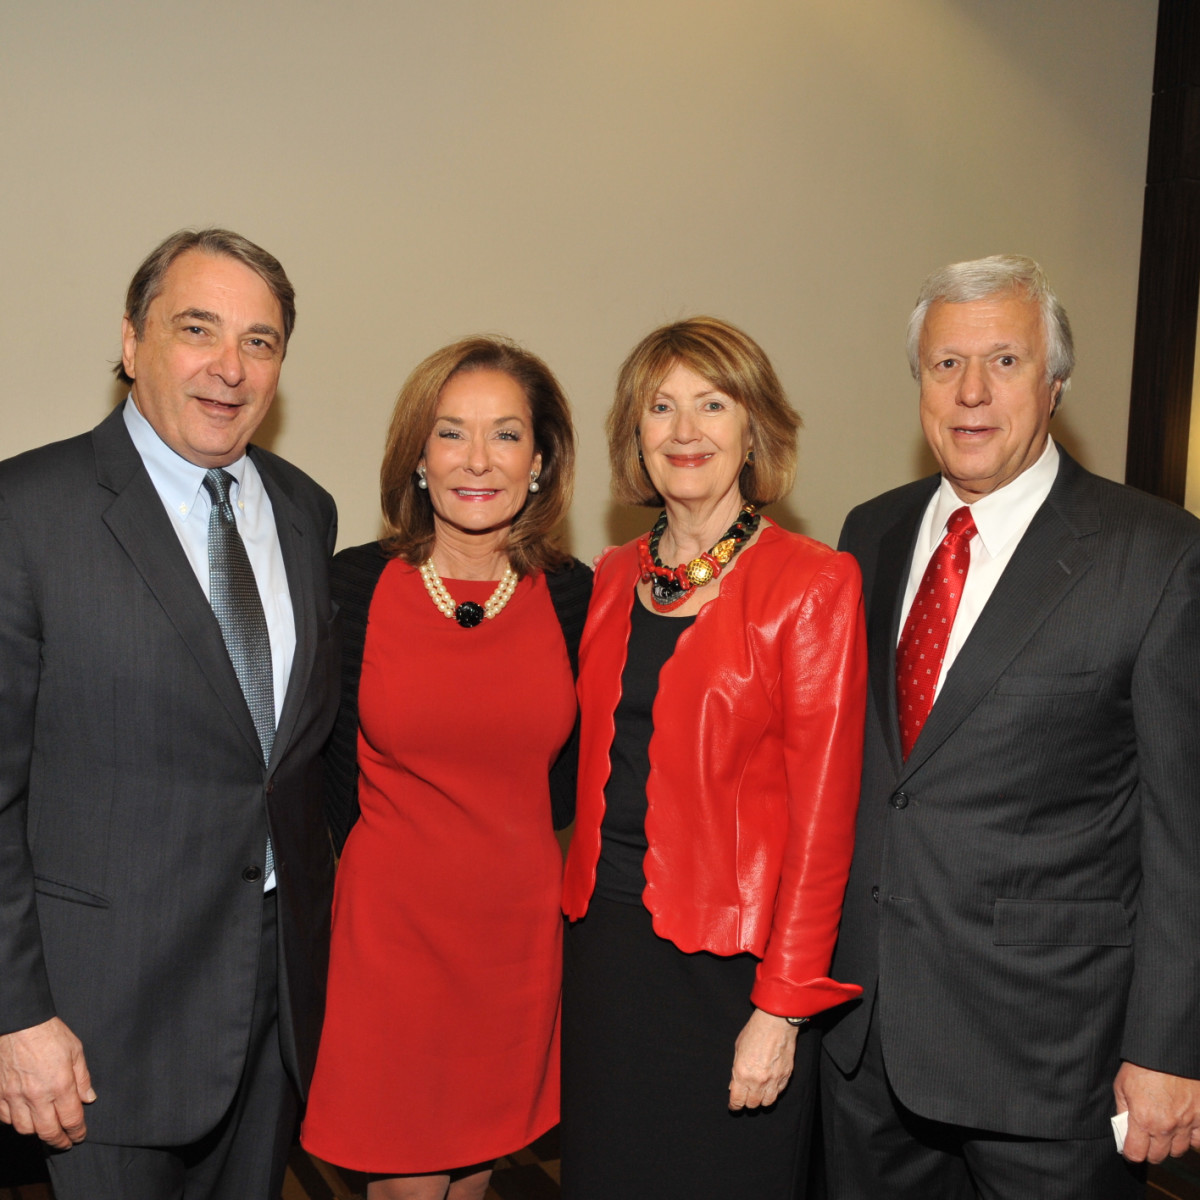 ADL Jurisprudence Award, 4/16 Mark Wawro, Melanie Gray, Cathy Lamboley, Glenn Rosenbaum